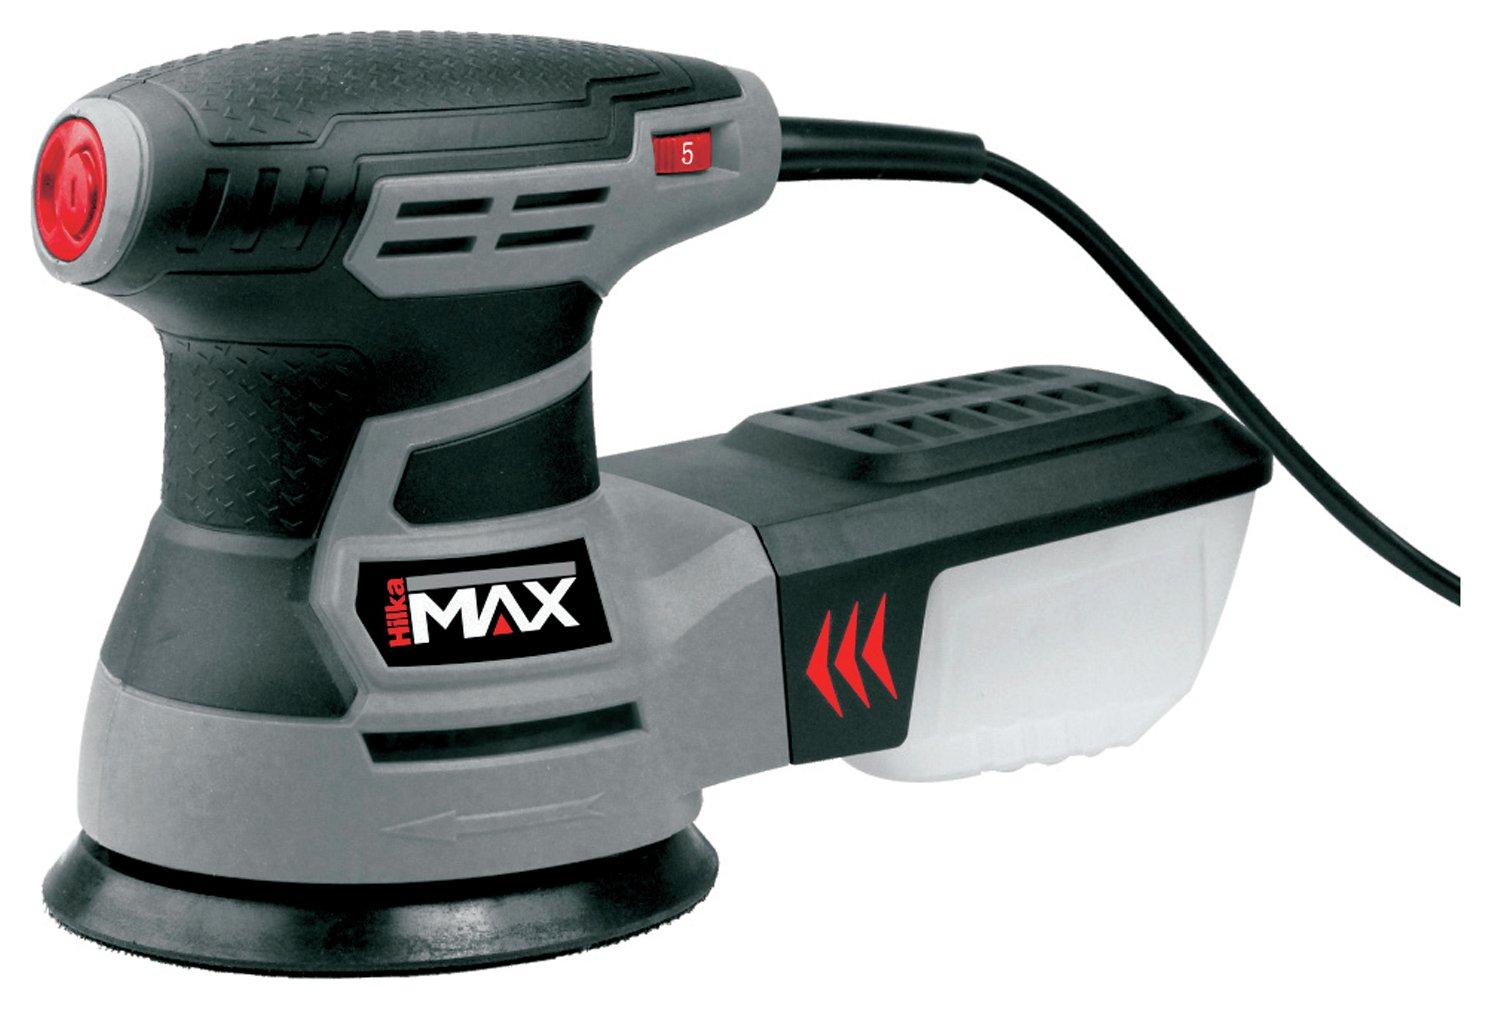 Hilka Max 350w Random Orbit Sander. lowest price